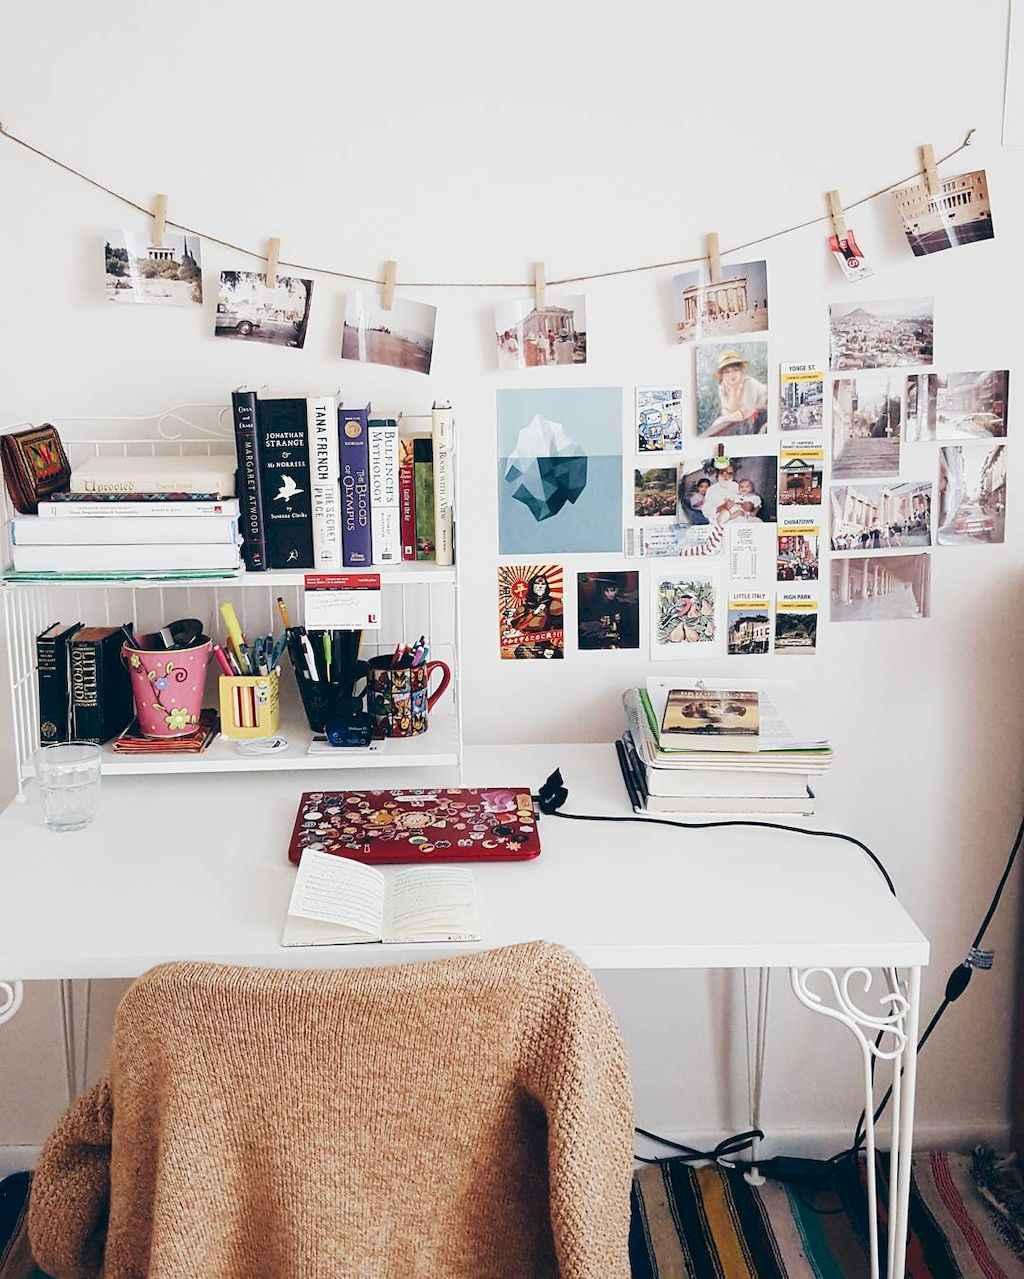 Cute diy dorm room decorating ideas on a budget (41)